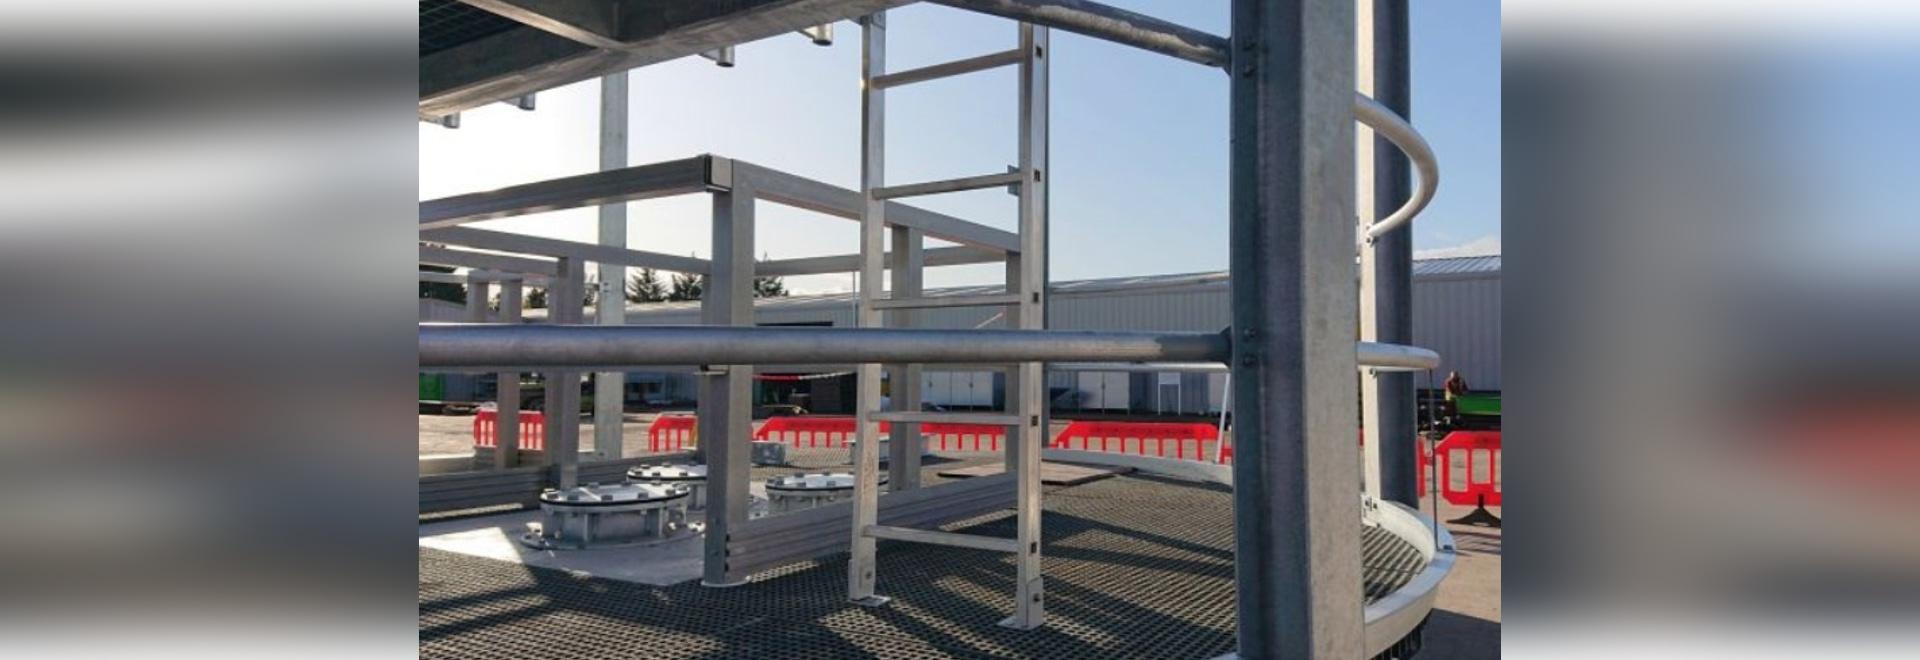 Each SIP weighs ten tonnes Photo: Hutchinson Engineering Ltd